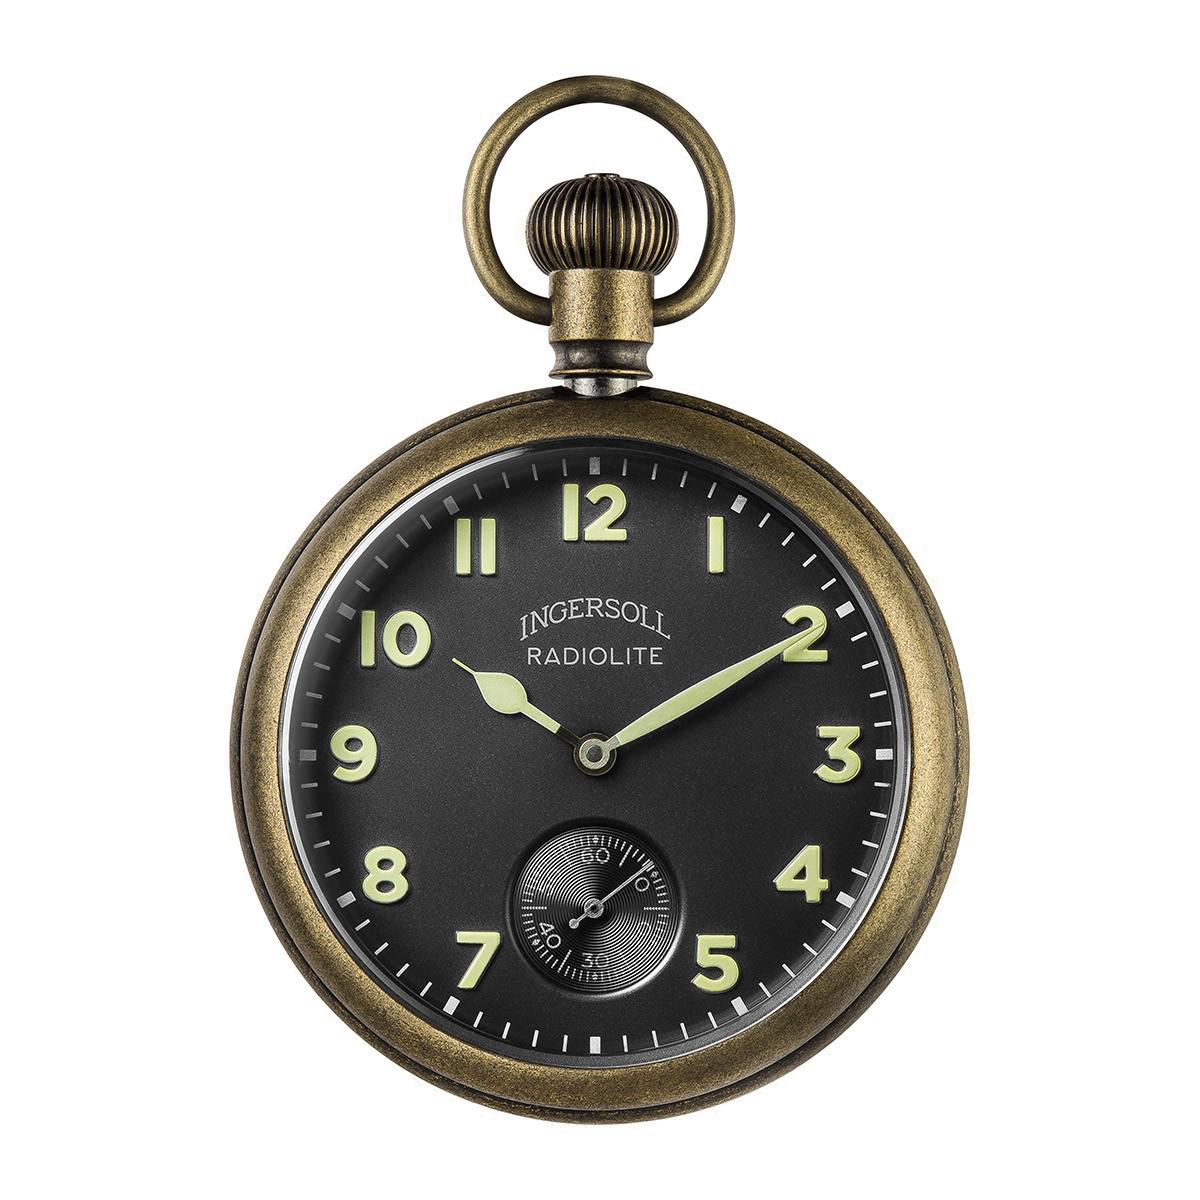 ساعت جیبی عقربه ای مردانه اینگرسل مدل I04901 | Ingersoll I04901 Watch For Men